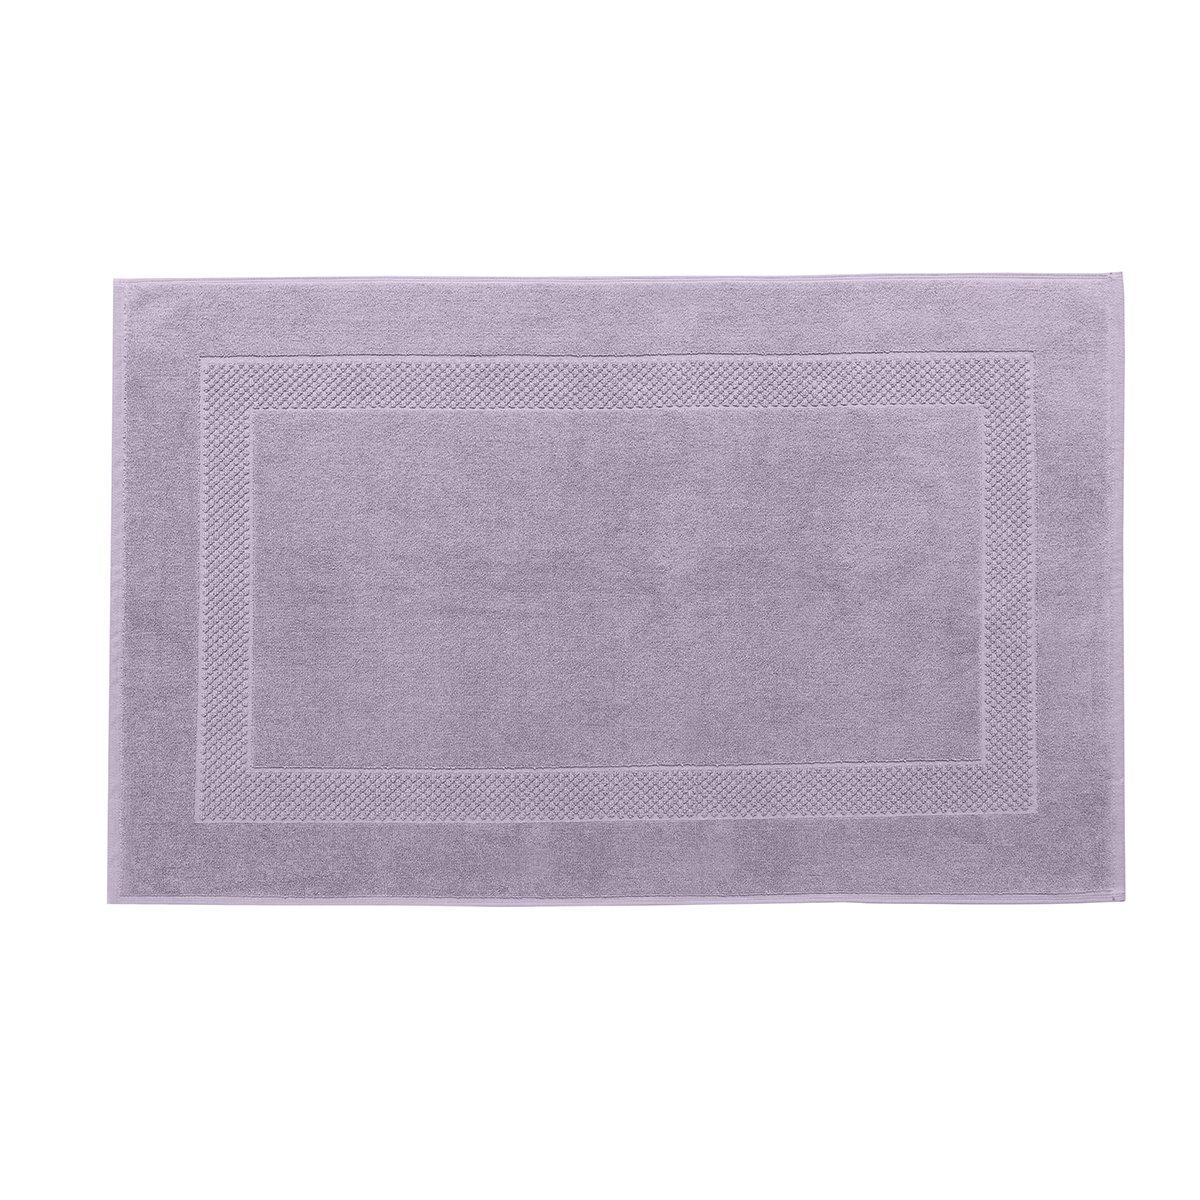 Tapis de bain coton 60x80 cm anémone